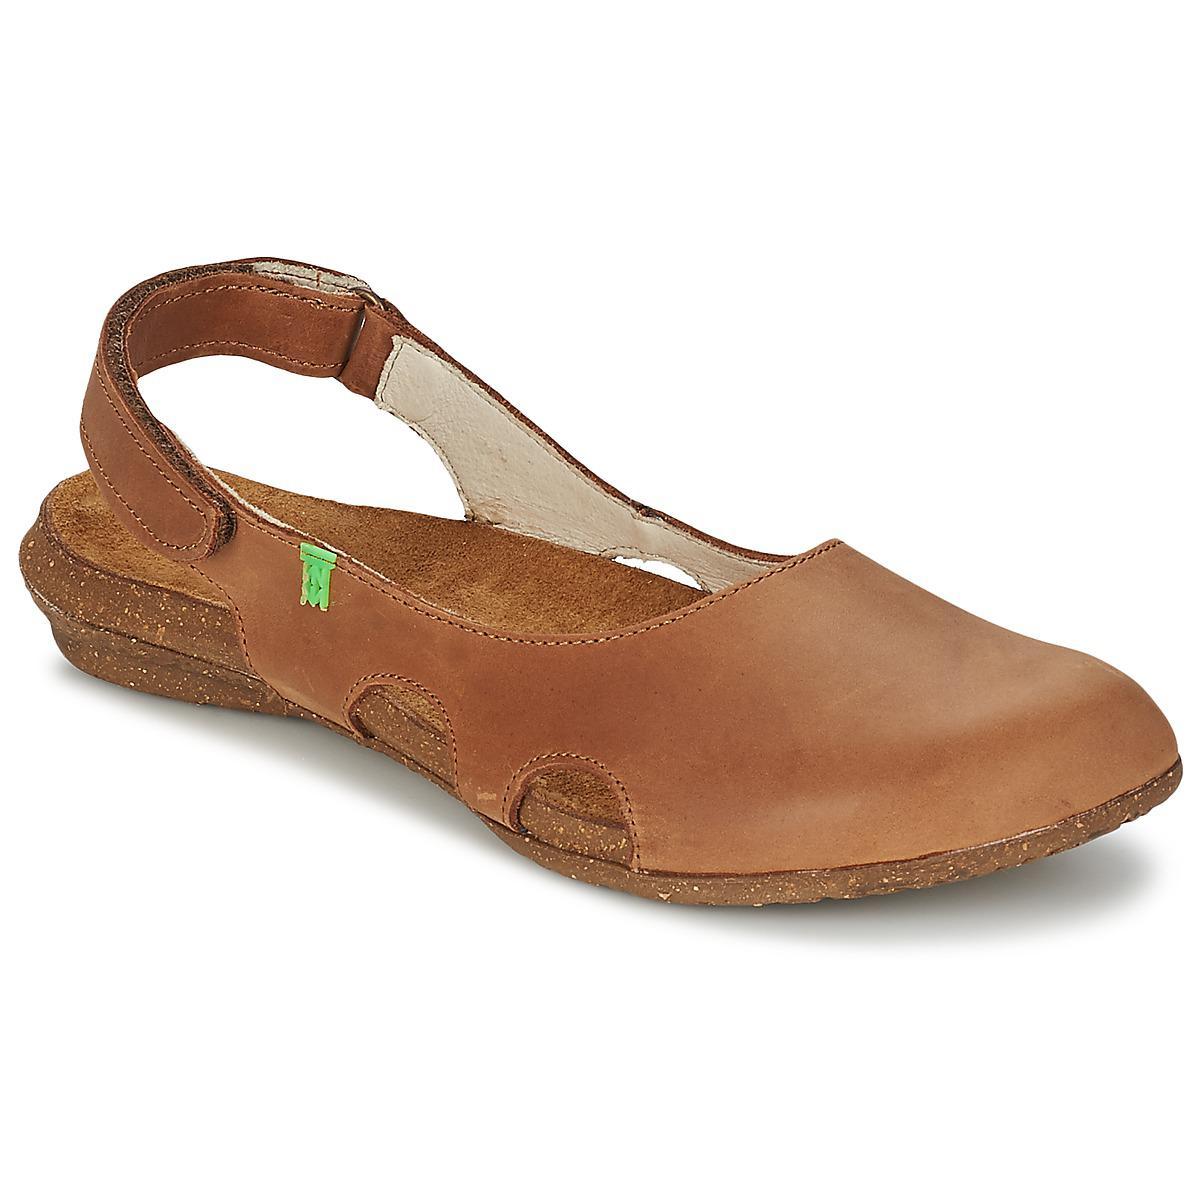 d22927ea4278 El Naturalista Wakataua Women s Sandals In Brown in Brown - Save 5 ...